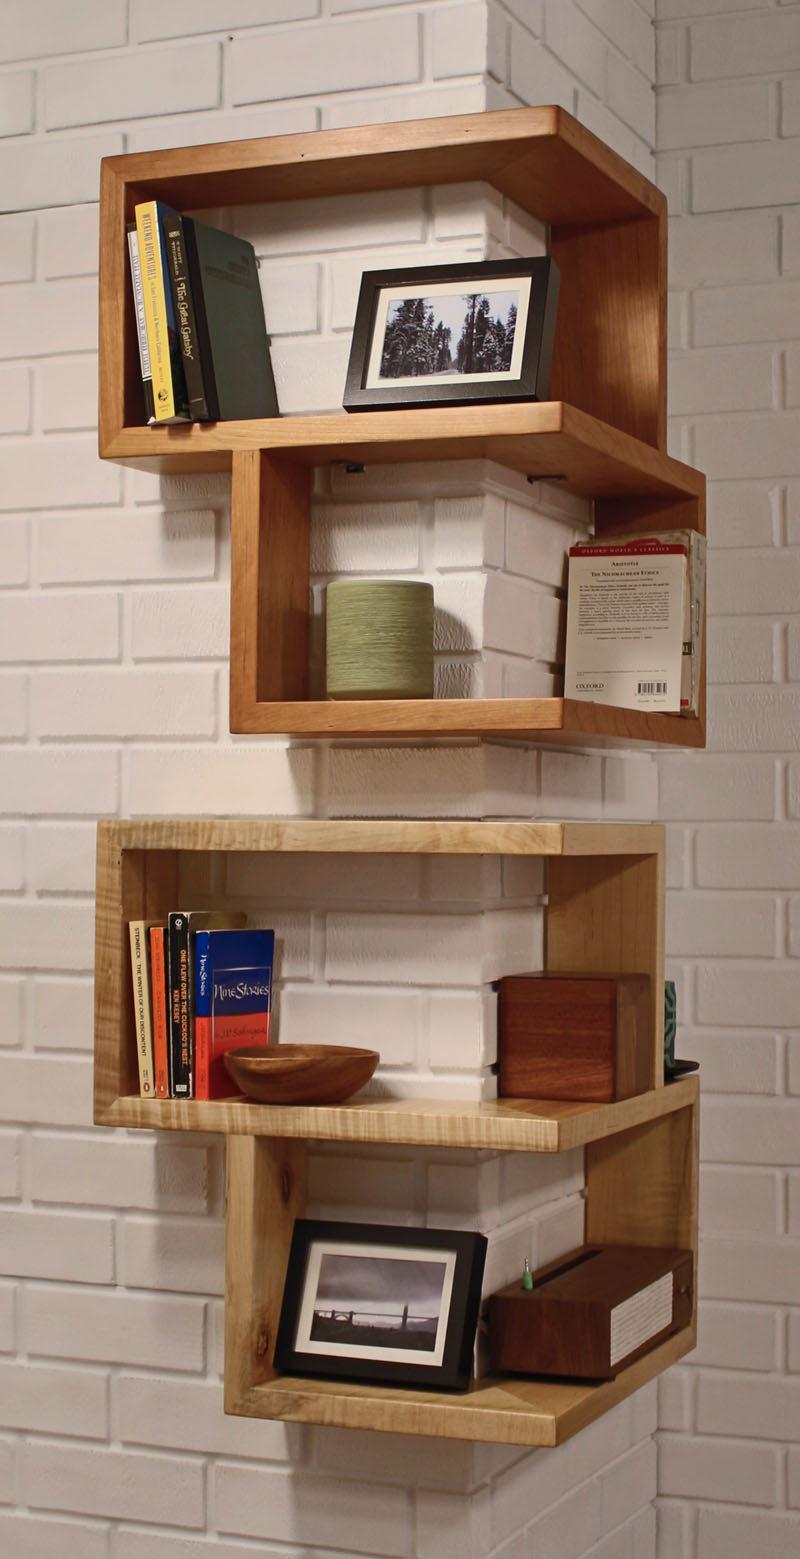 Surprising Shelving Design Idea Shelves That Wrap Around Corners Interior Design Ideas Philsoteloinfo